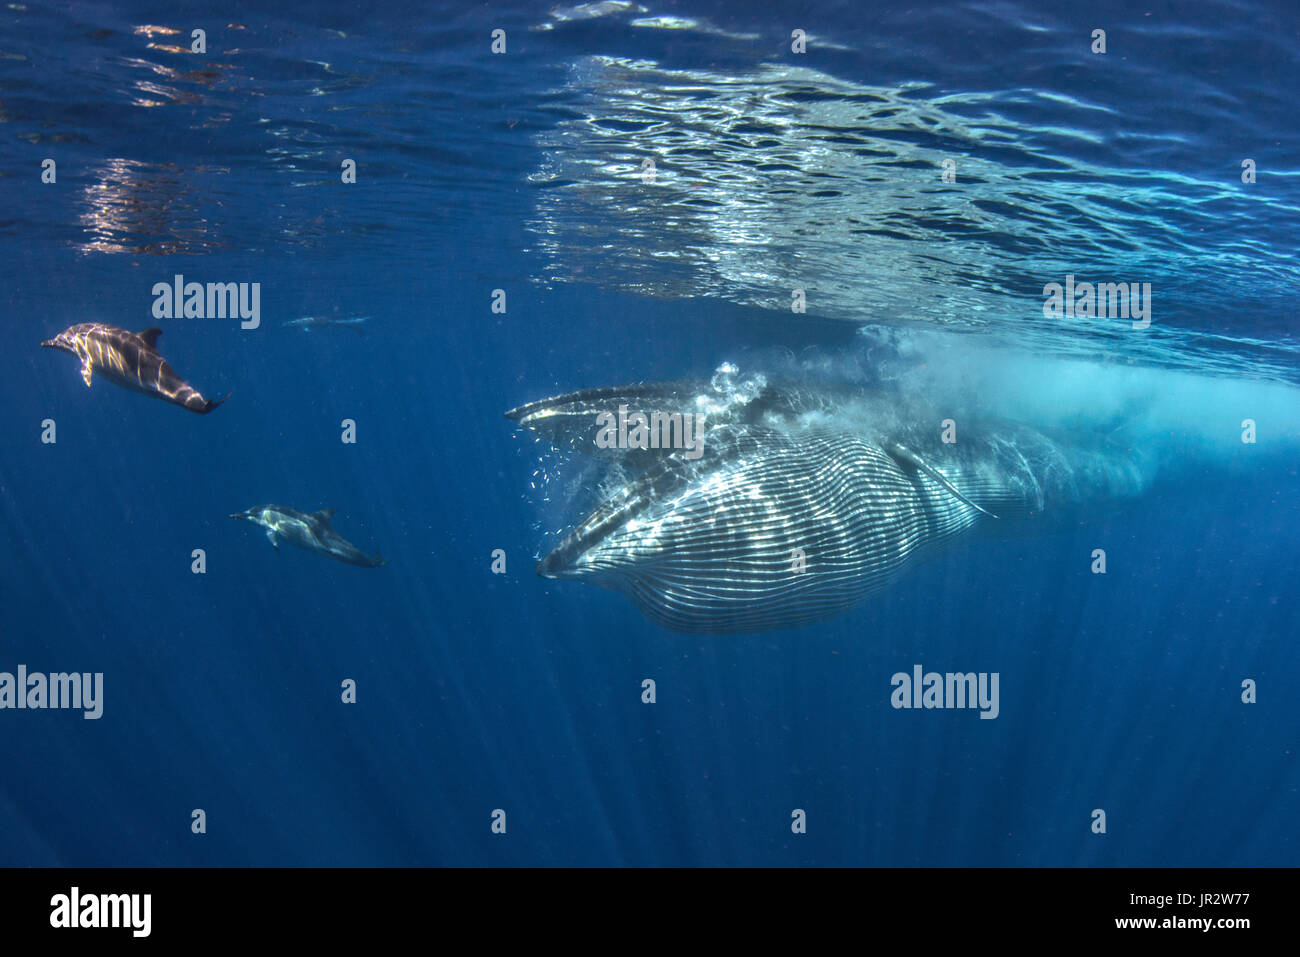 Bryde's whale (Balaenoptera brydei, edeni), Whale eating, Tenerife, Canary Islands. - Stock Image